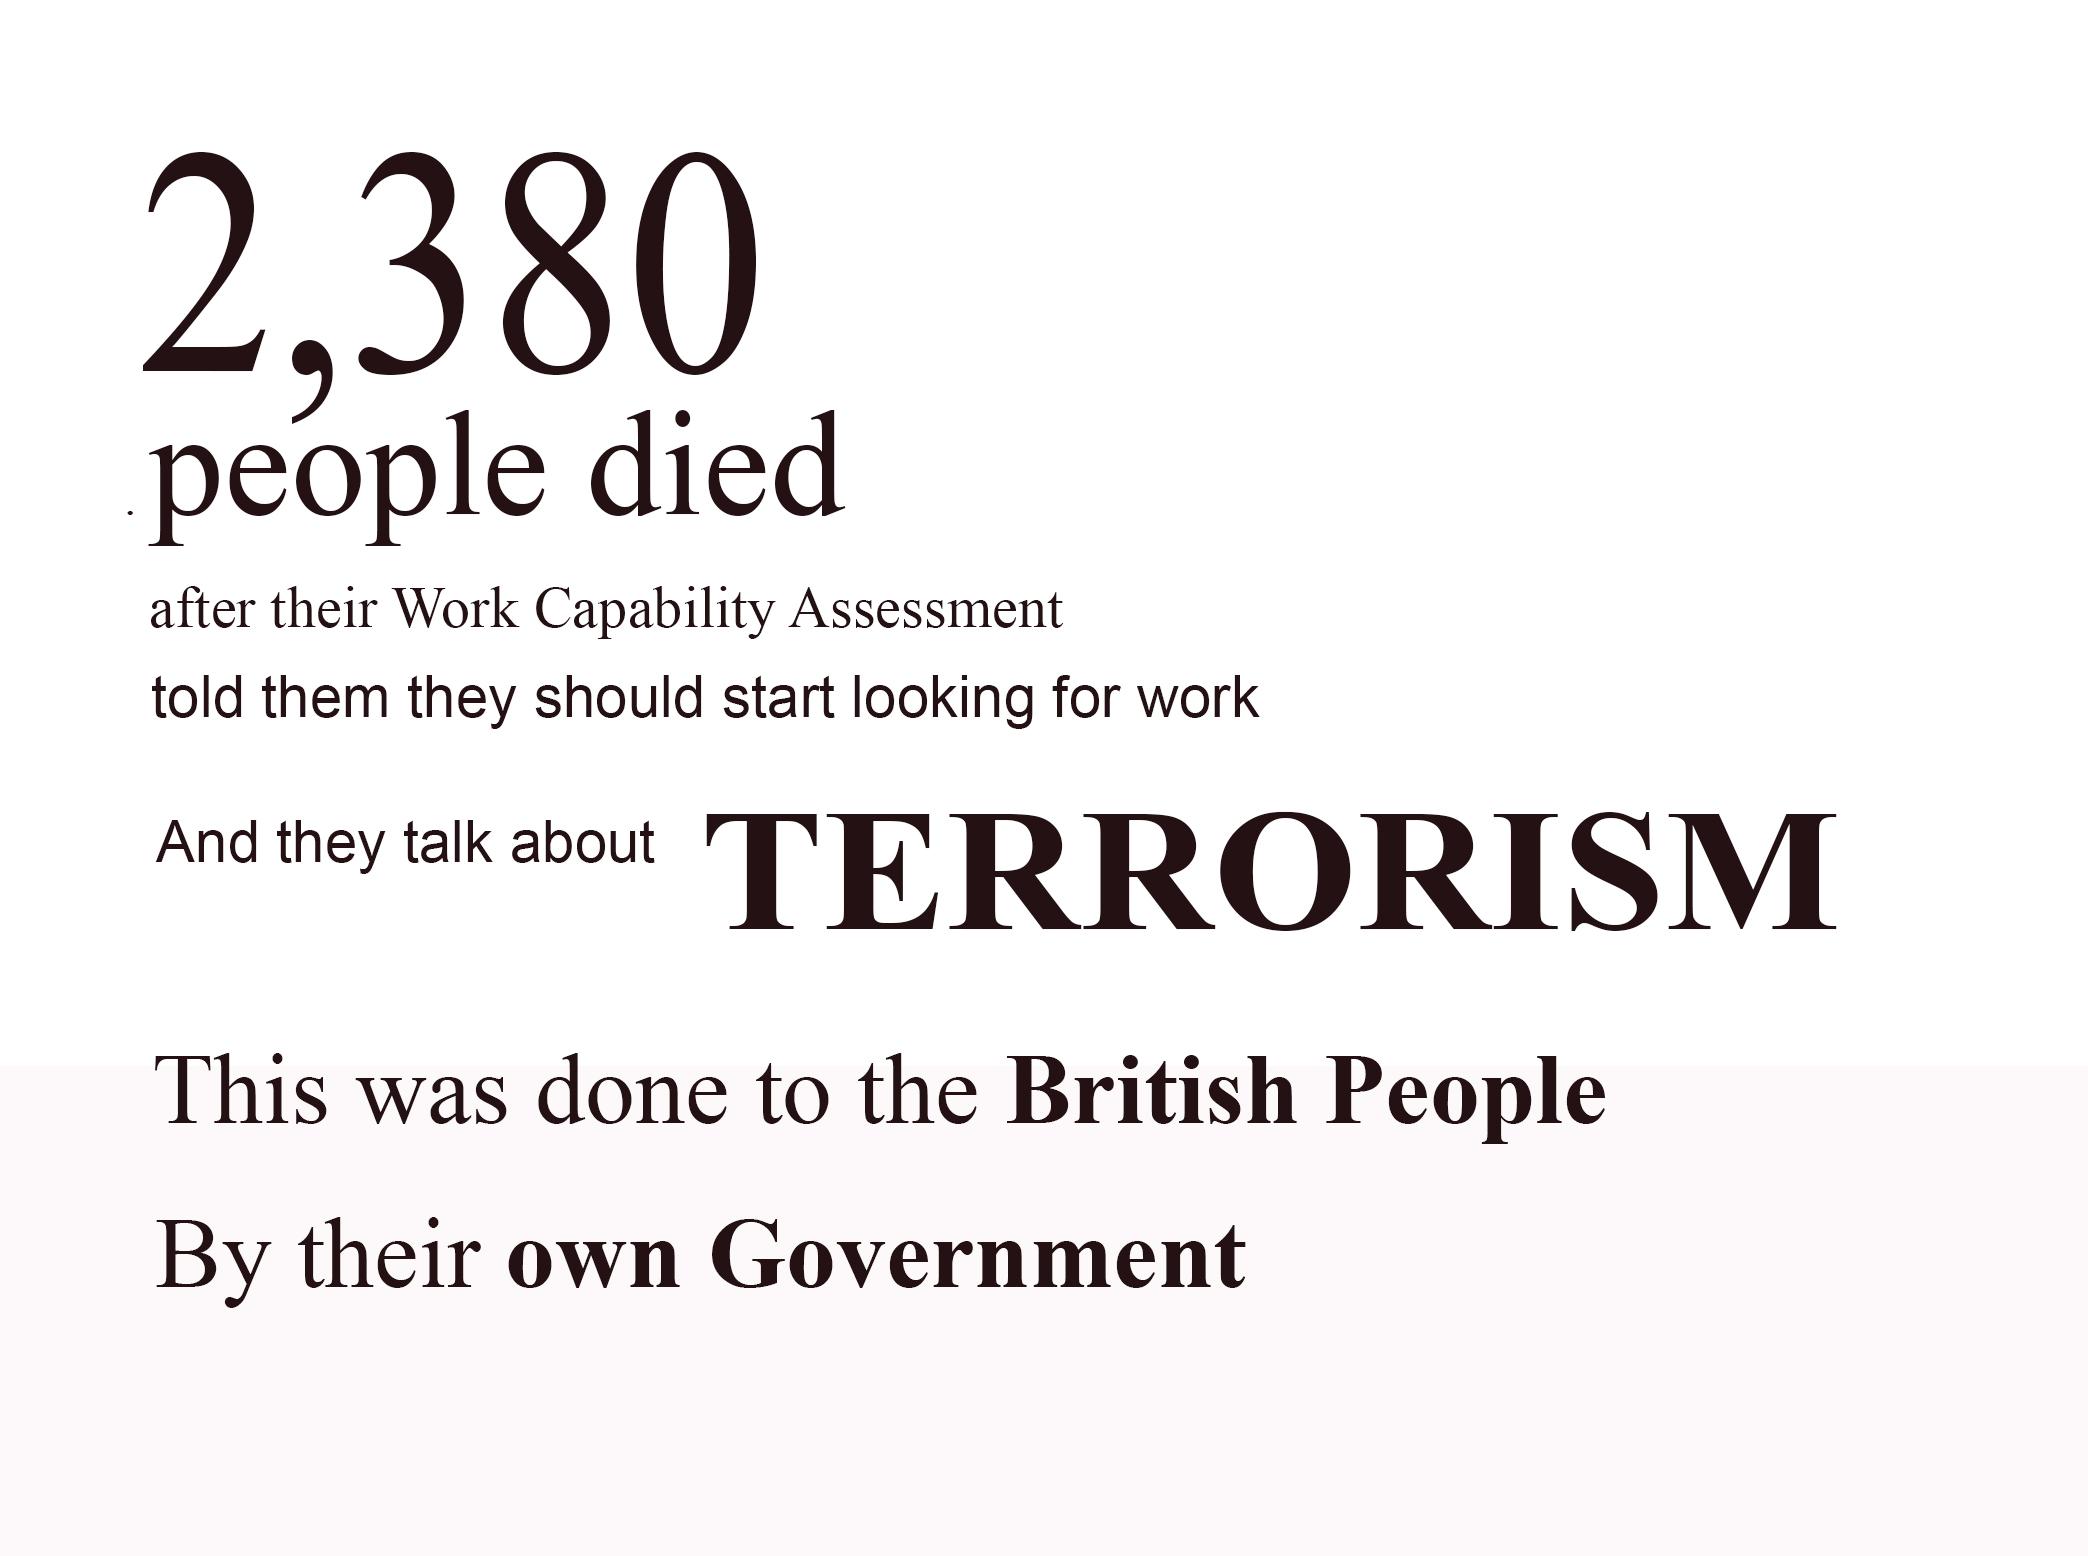 terrorism 2